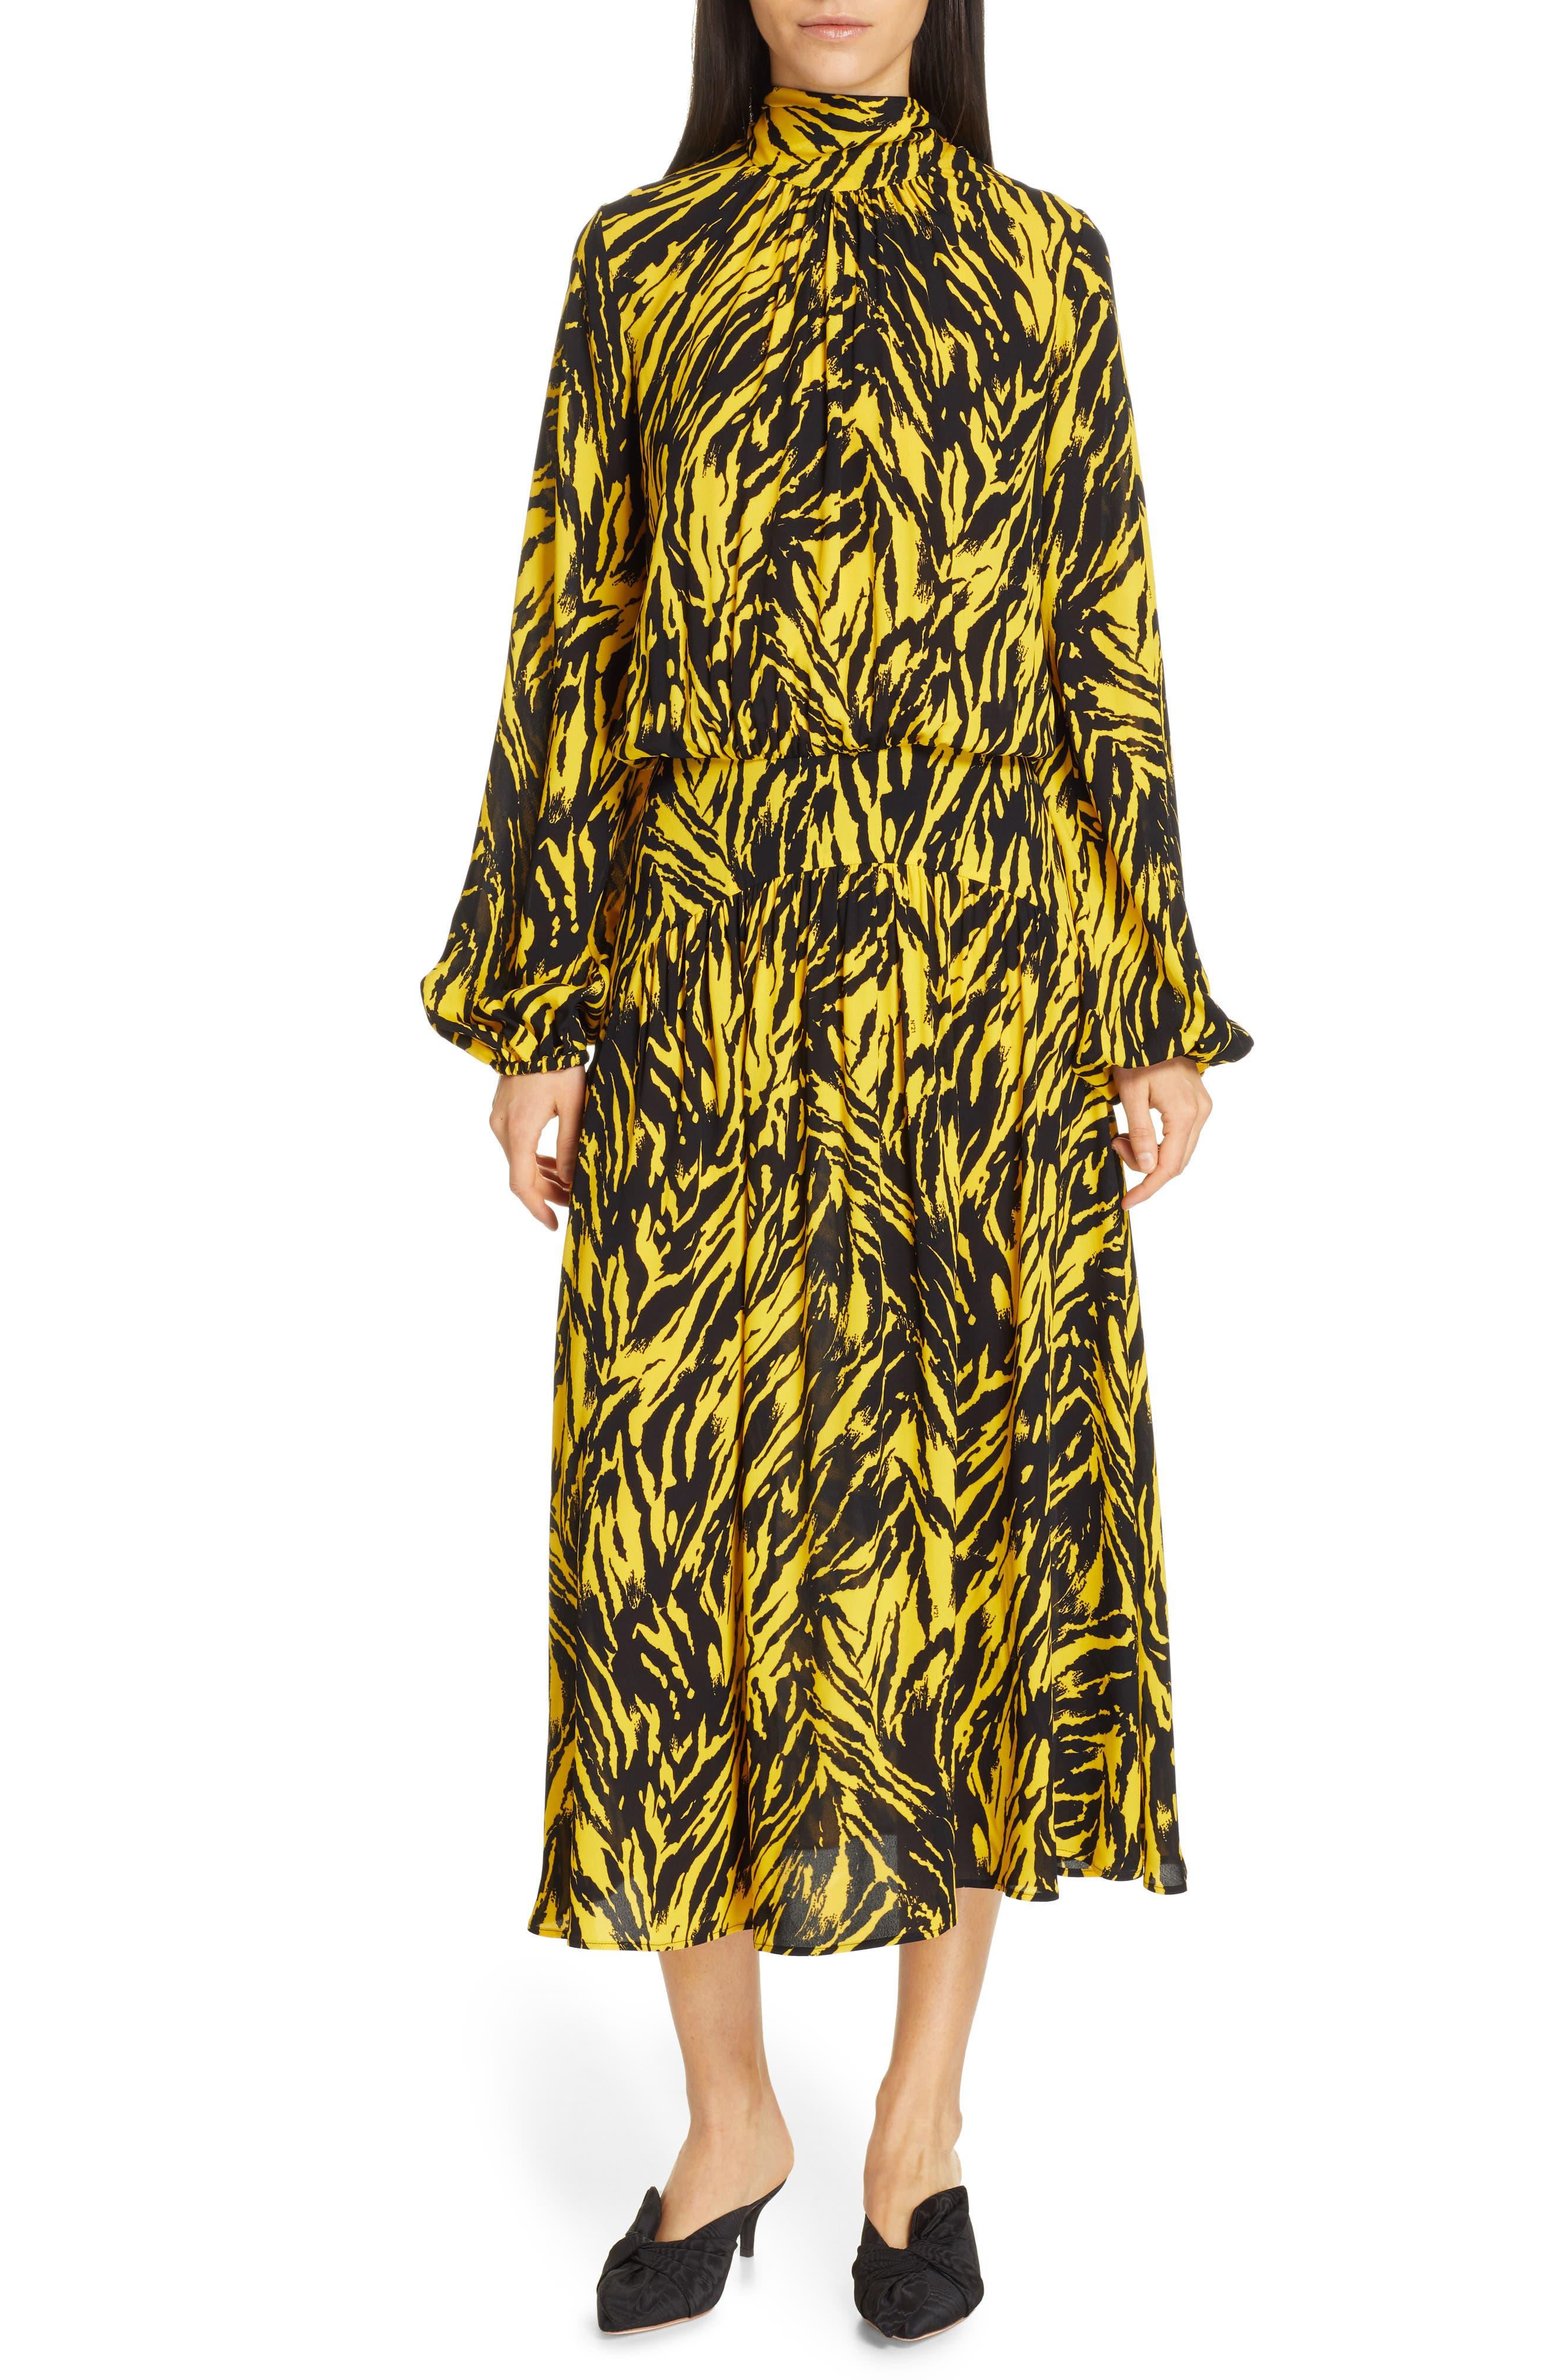 N°21 Dresses Zebra Print Long Sleeve Midi Dress